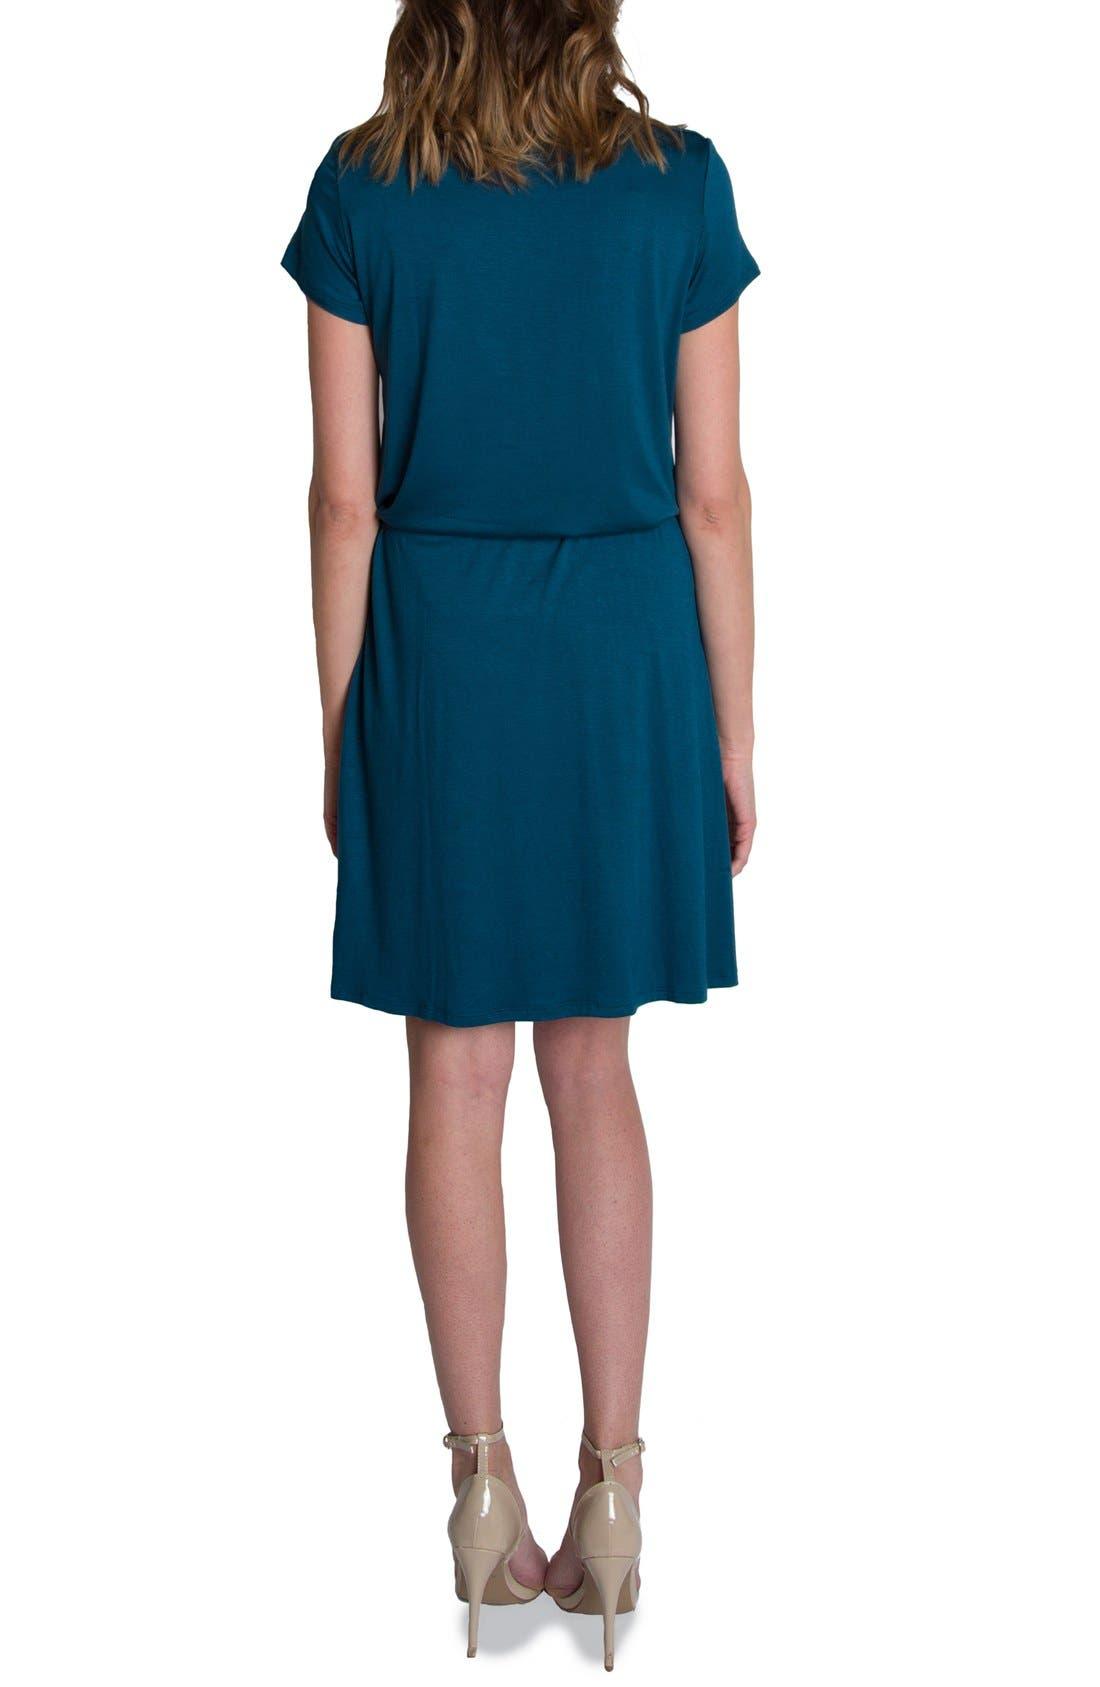 'Chic' Cowl Neck Nursing Dress,                             Alternate thumbnail 2, color,                             Teal